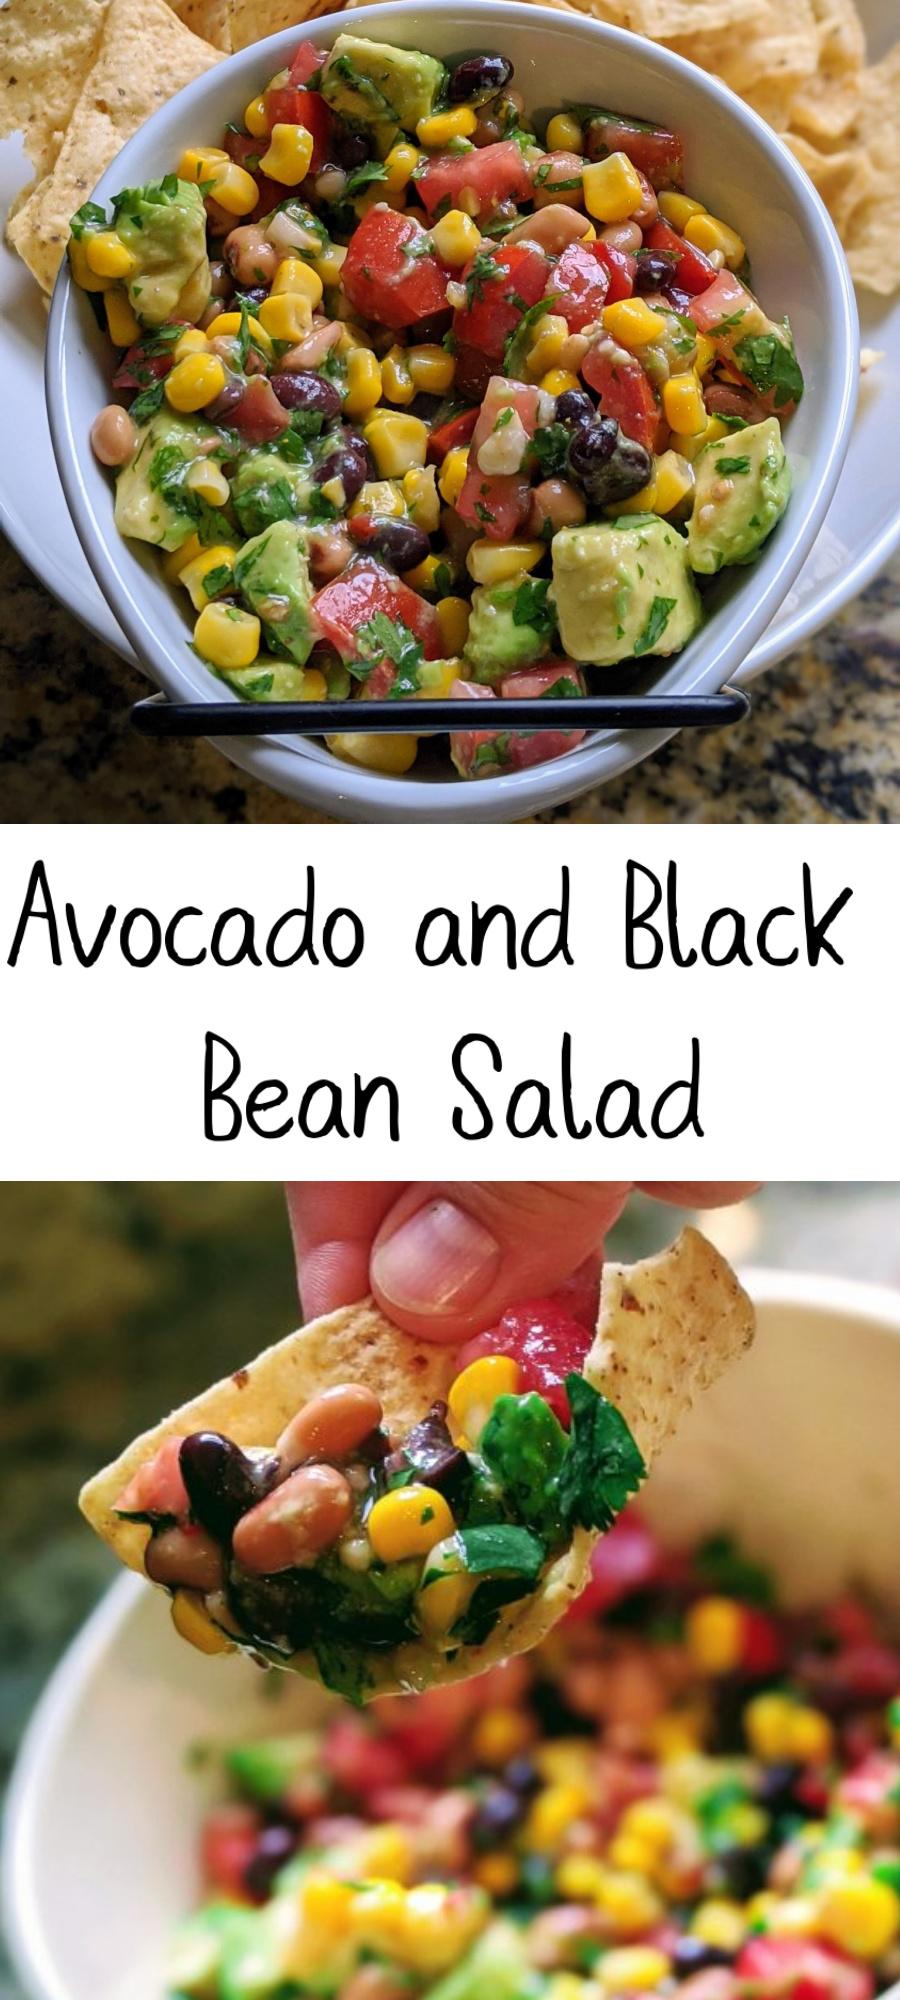 Collage of avocado salad